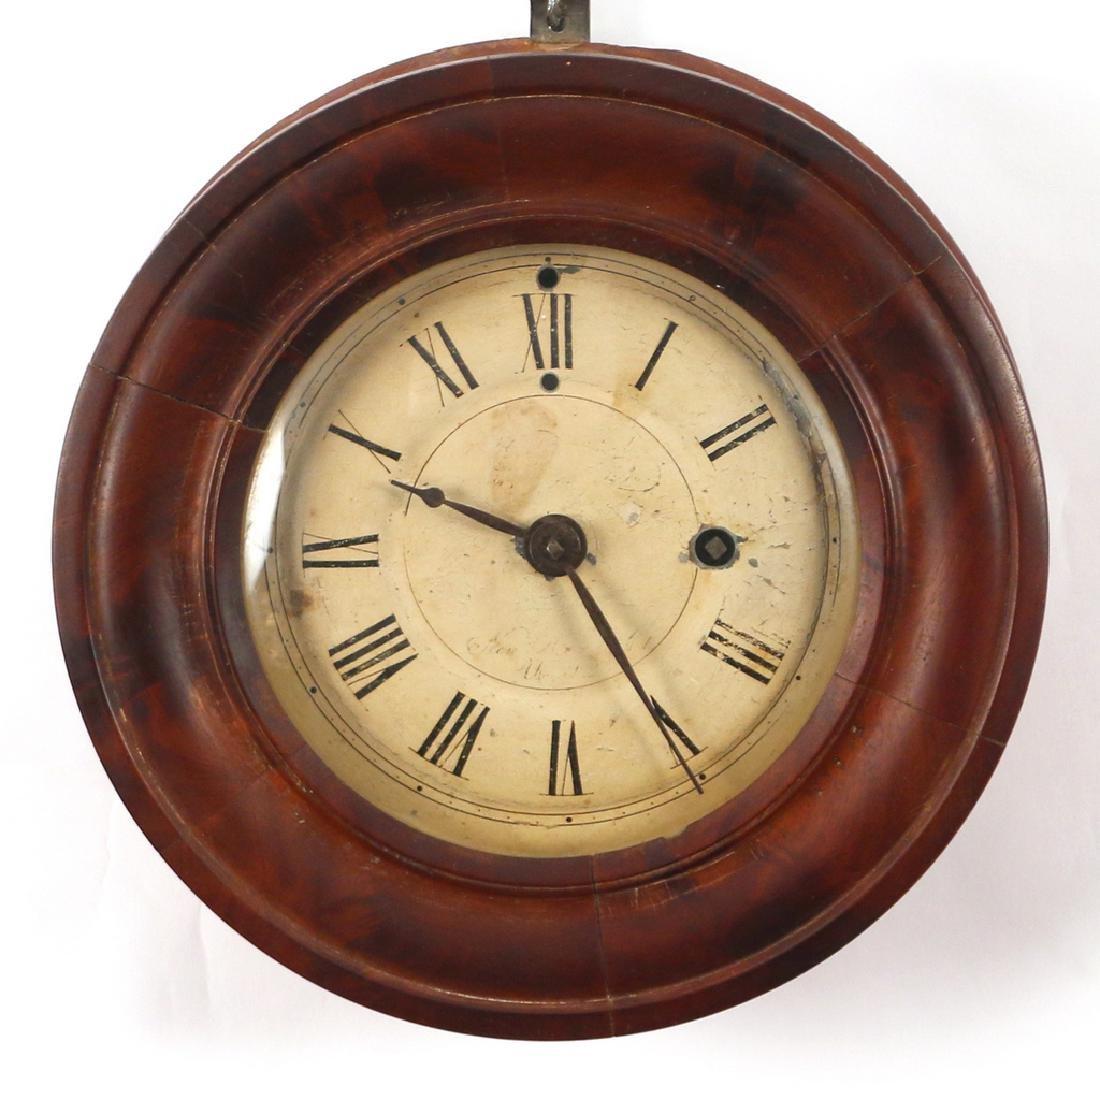 KIRK'S PATENT MARINE TIMEPIECE